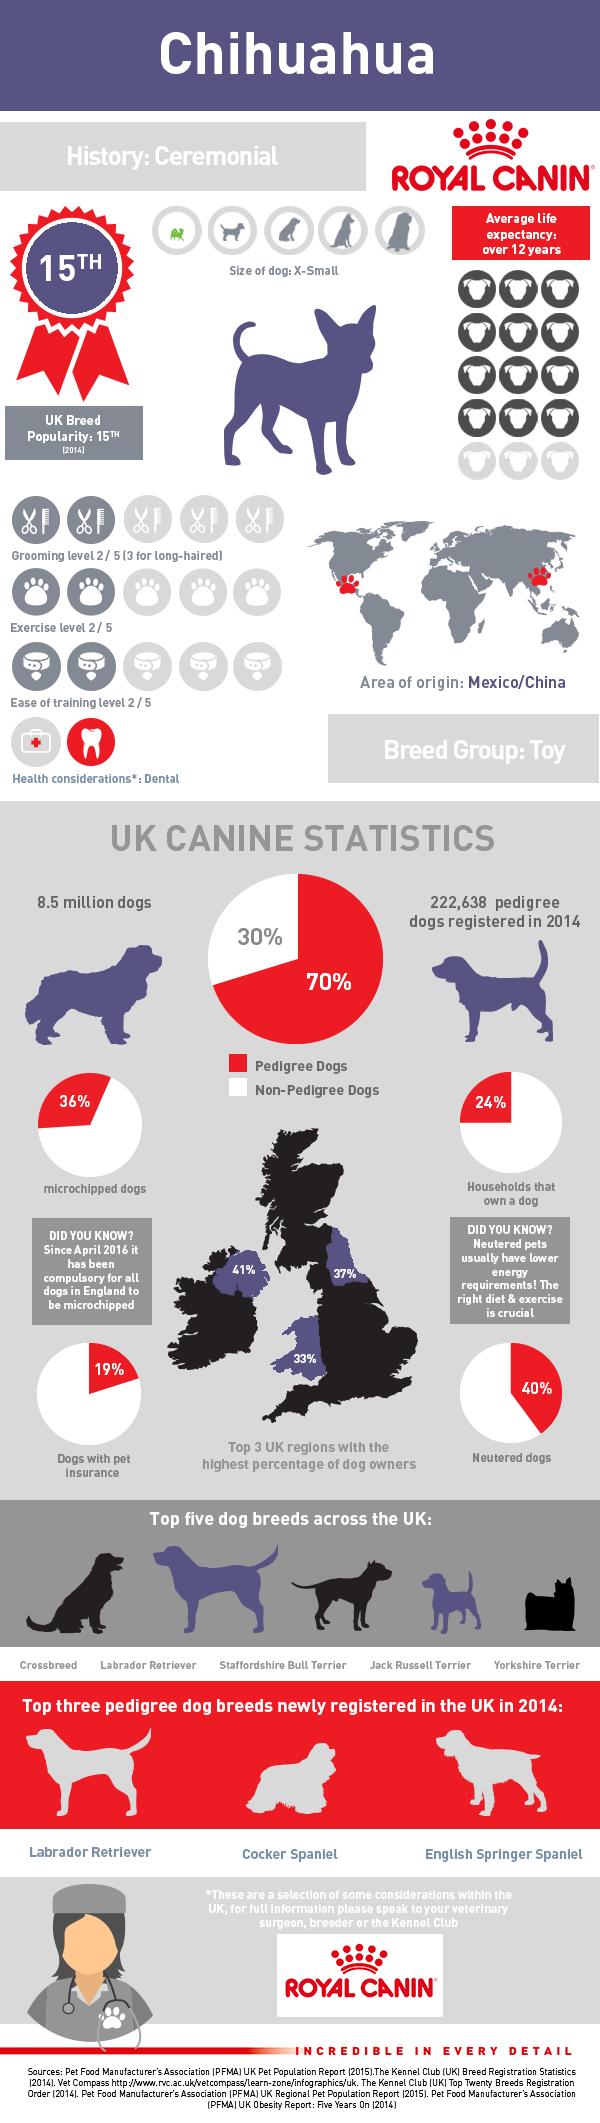 infographic-chihuahua